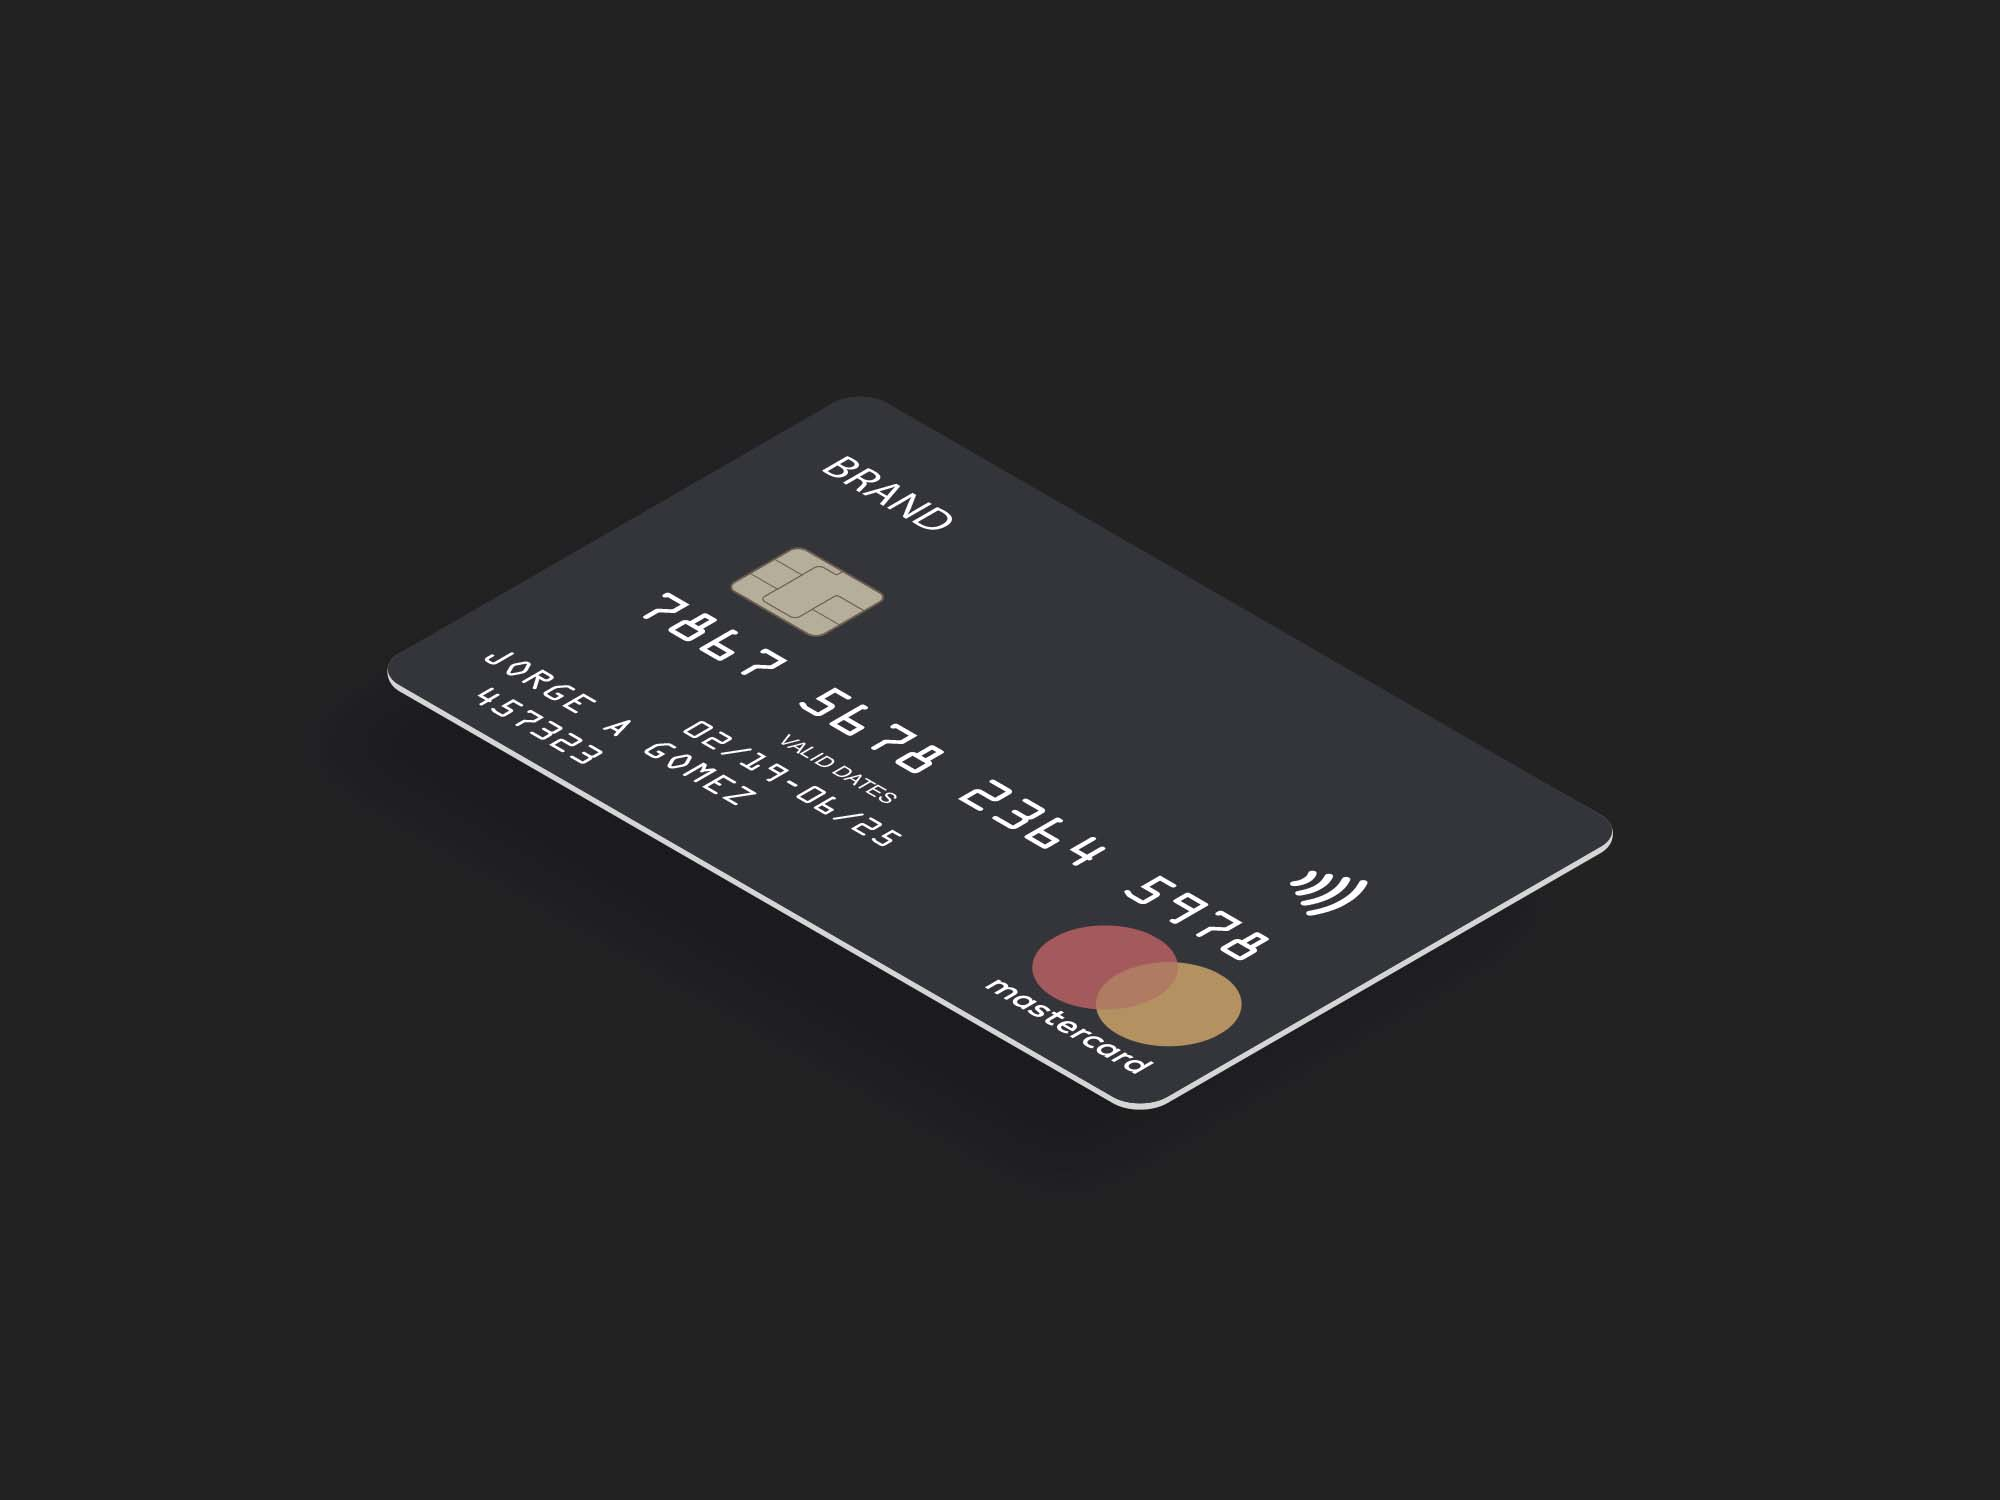 Free Contactless Credit Card Mockup Psd